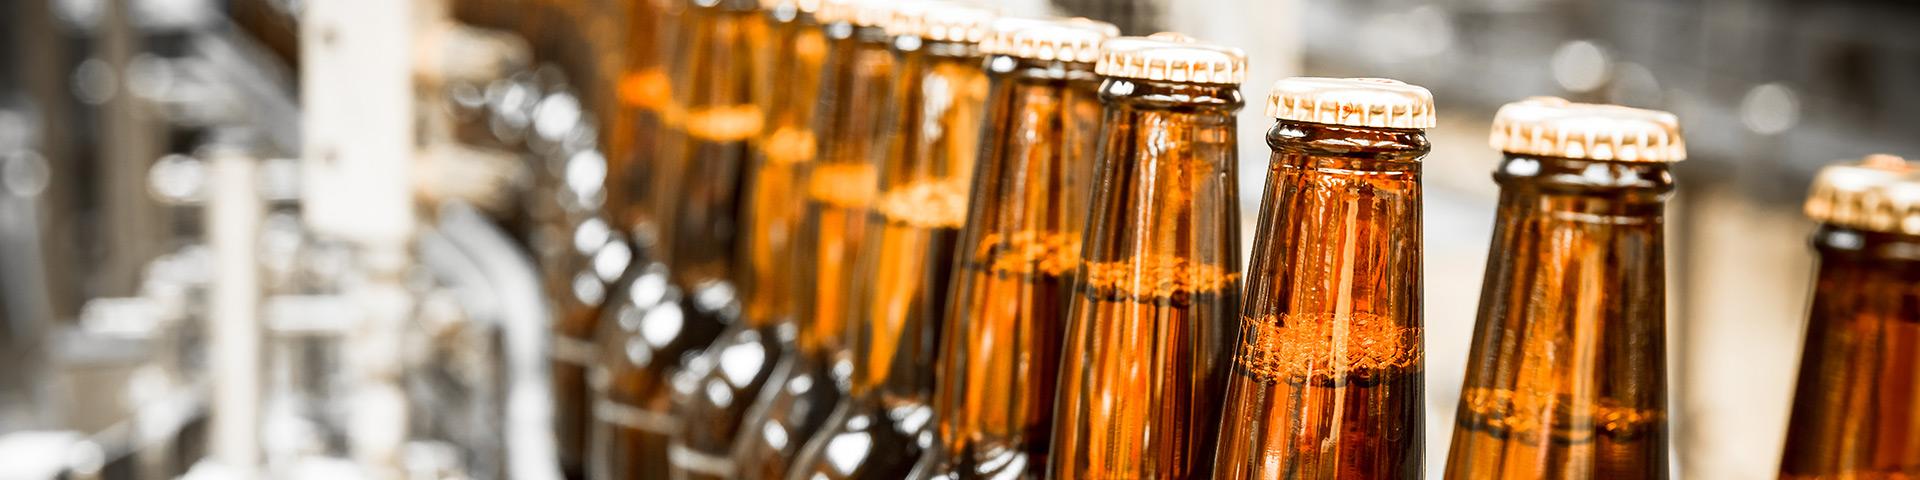 Cerveza artesanal Alfa Laval